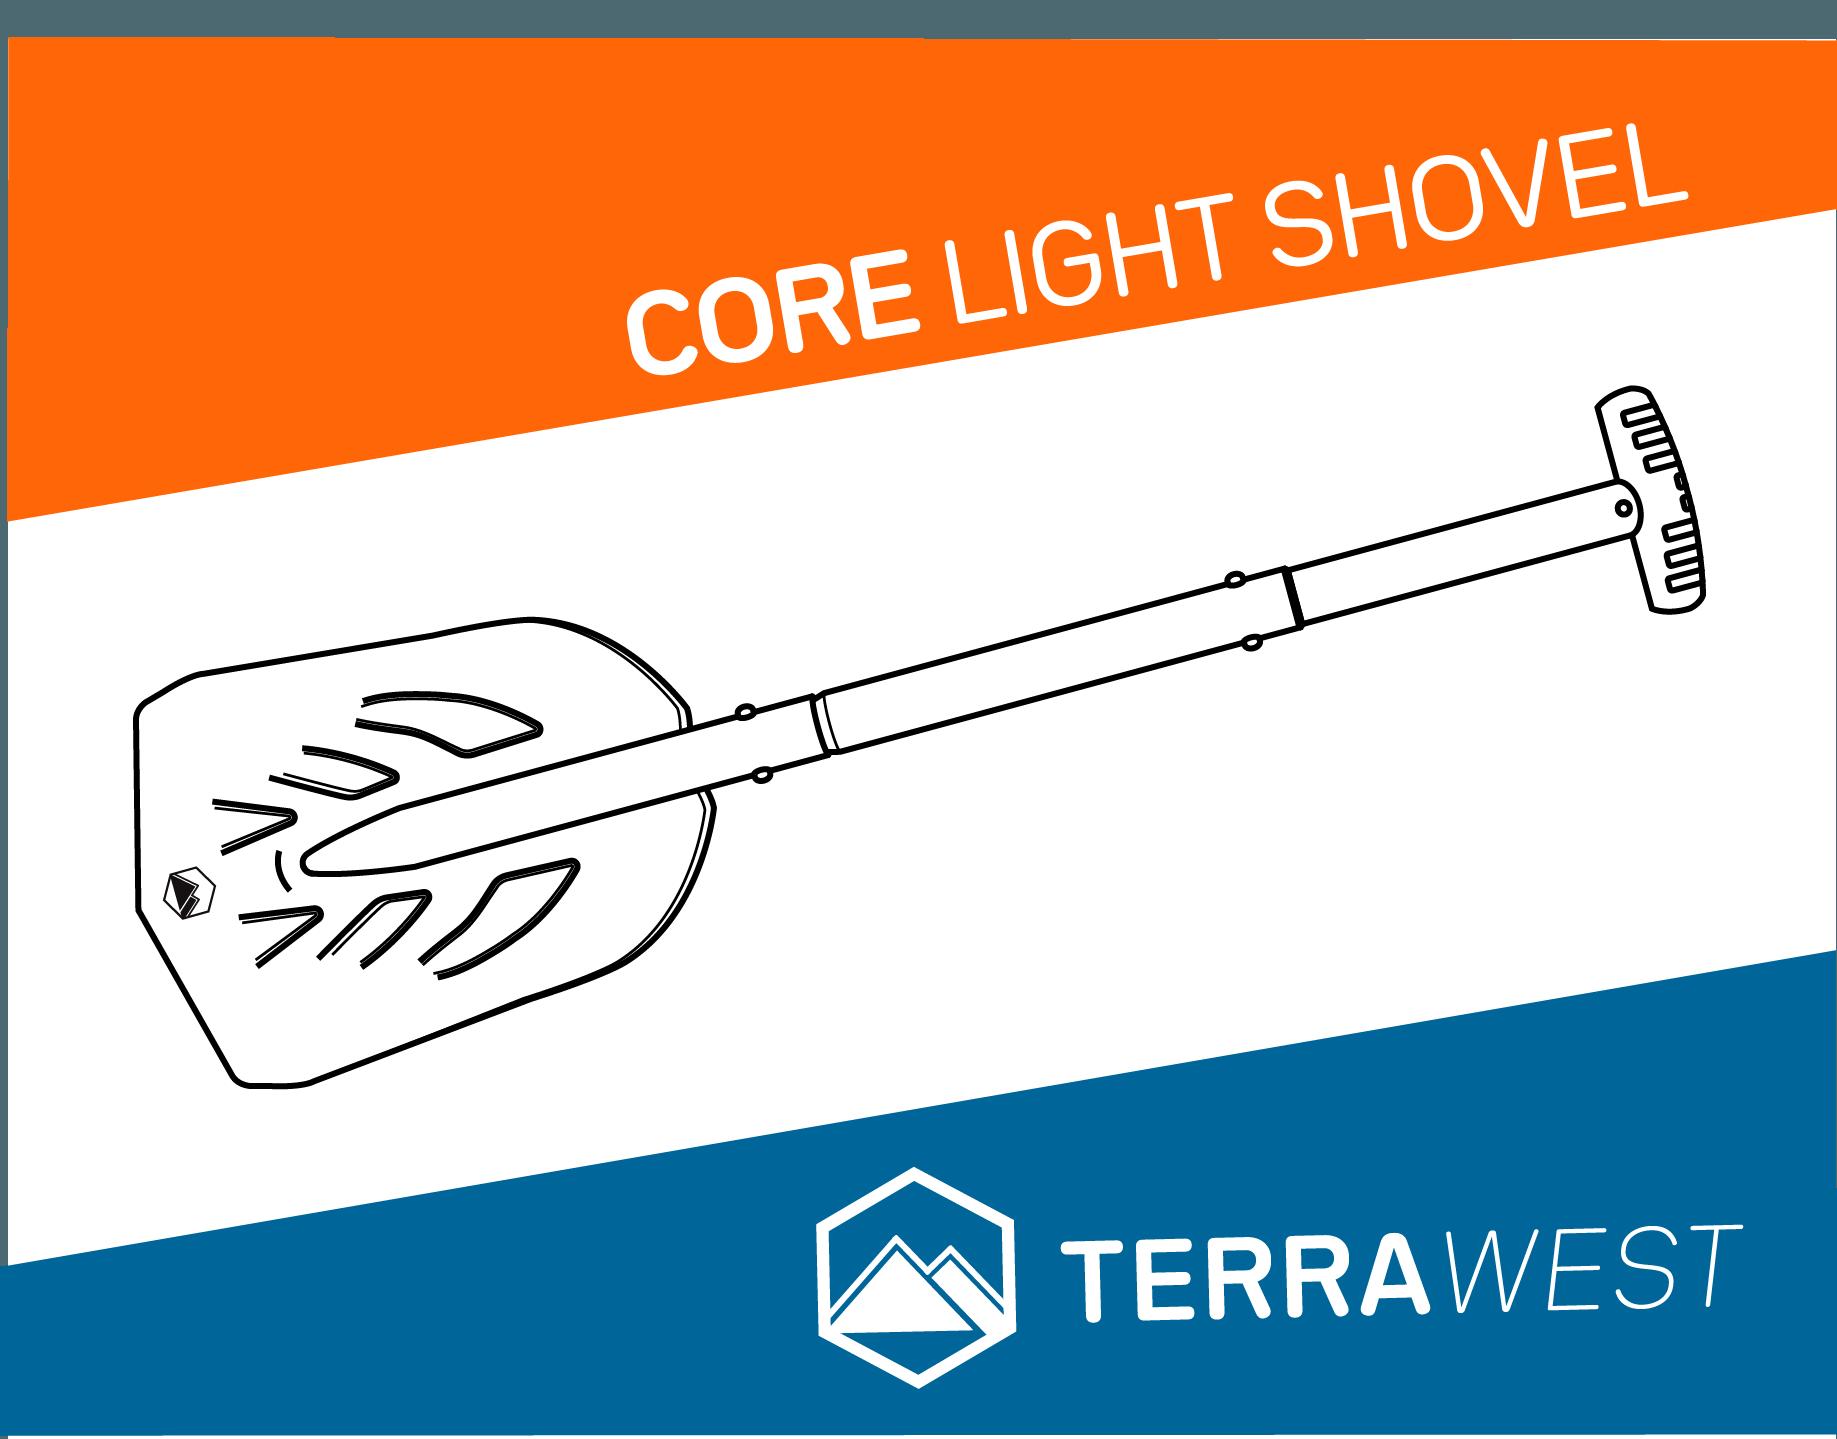 Terrawest Core Light Shovel